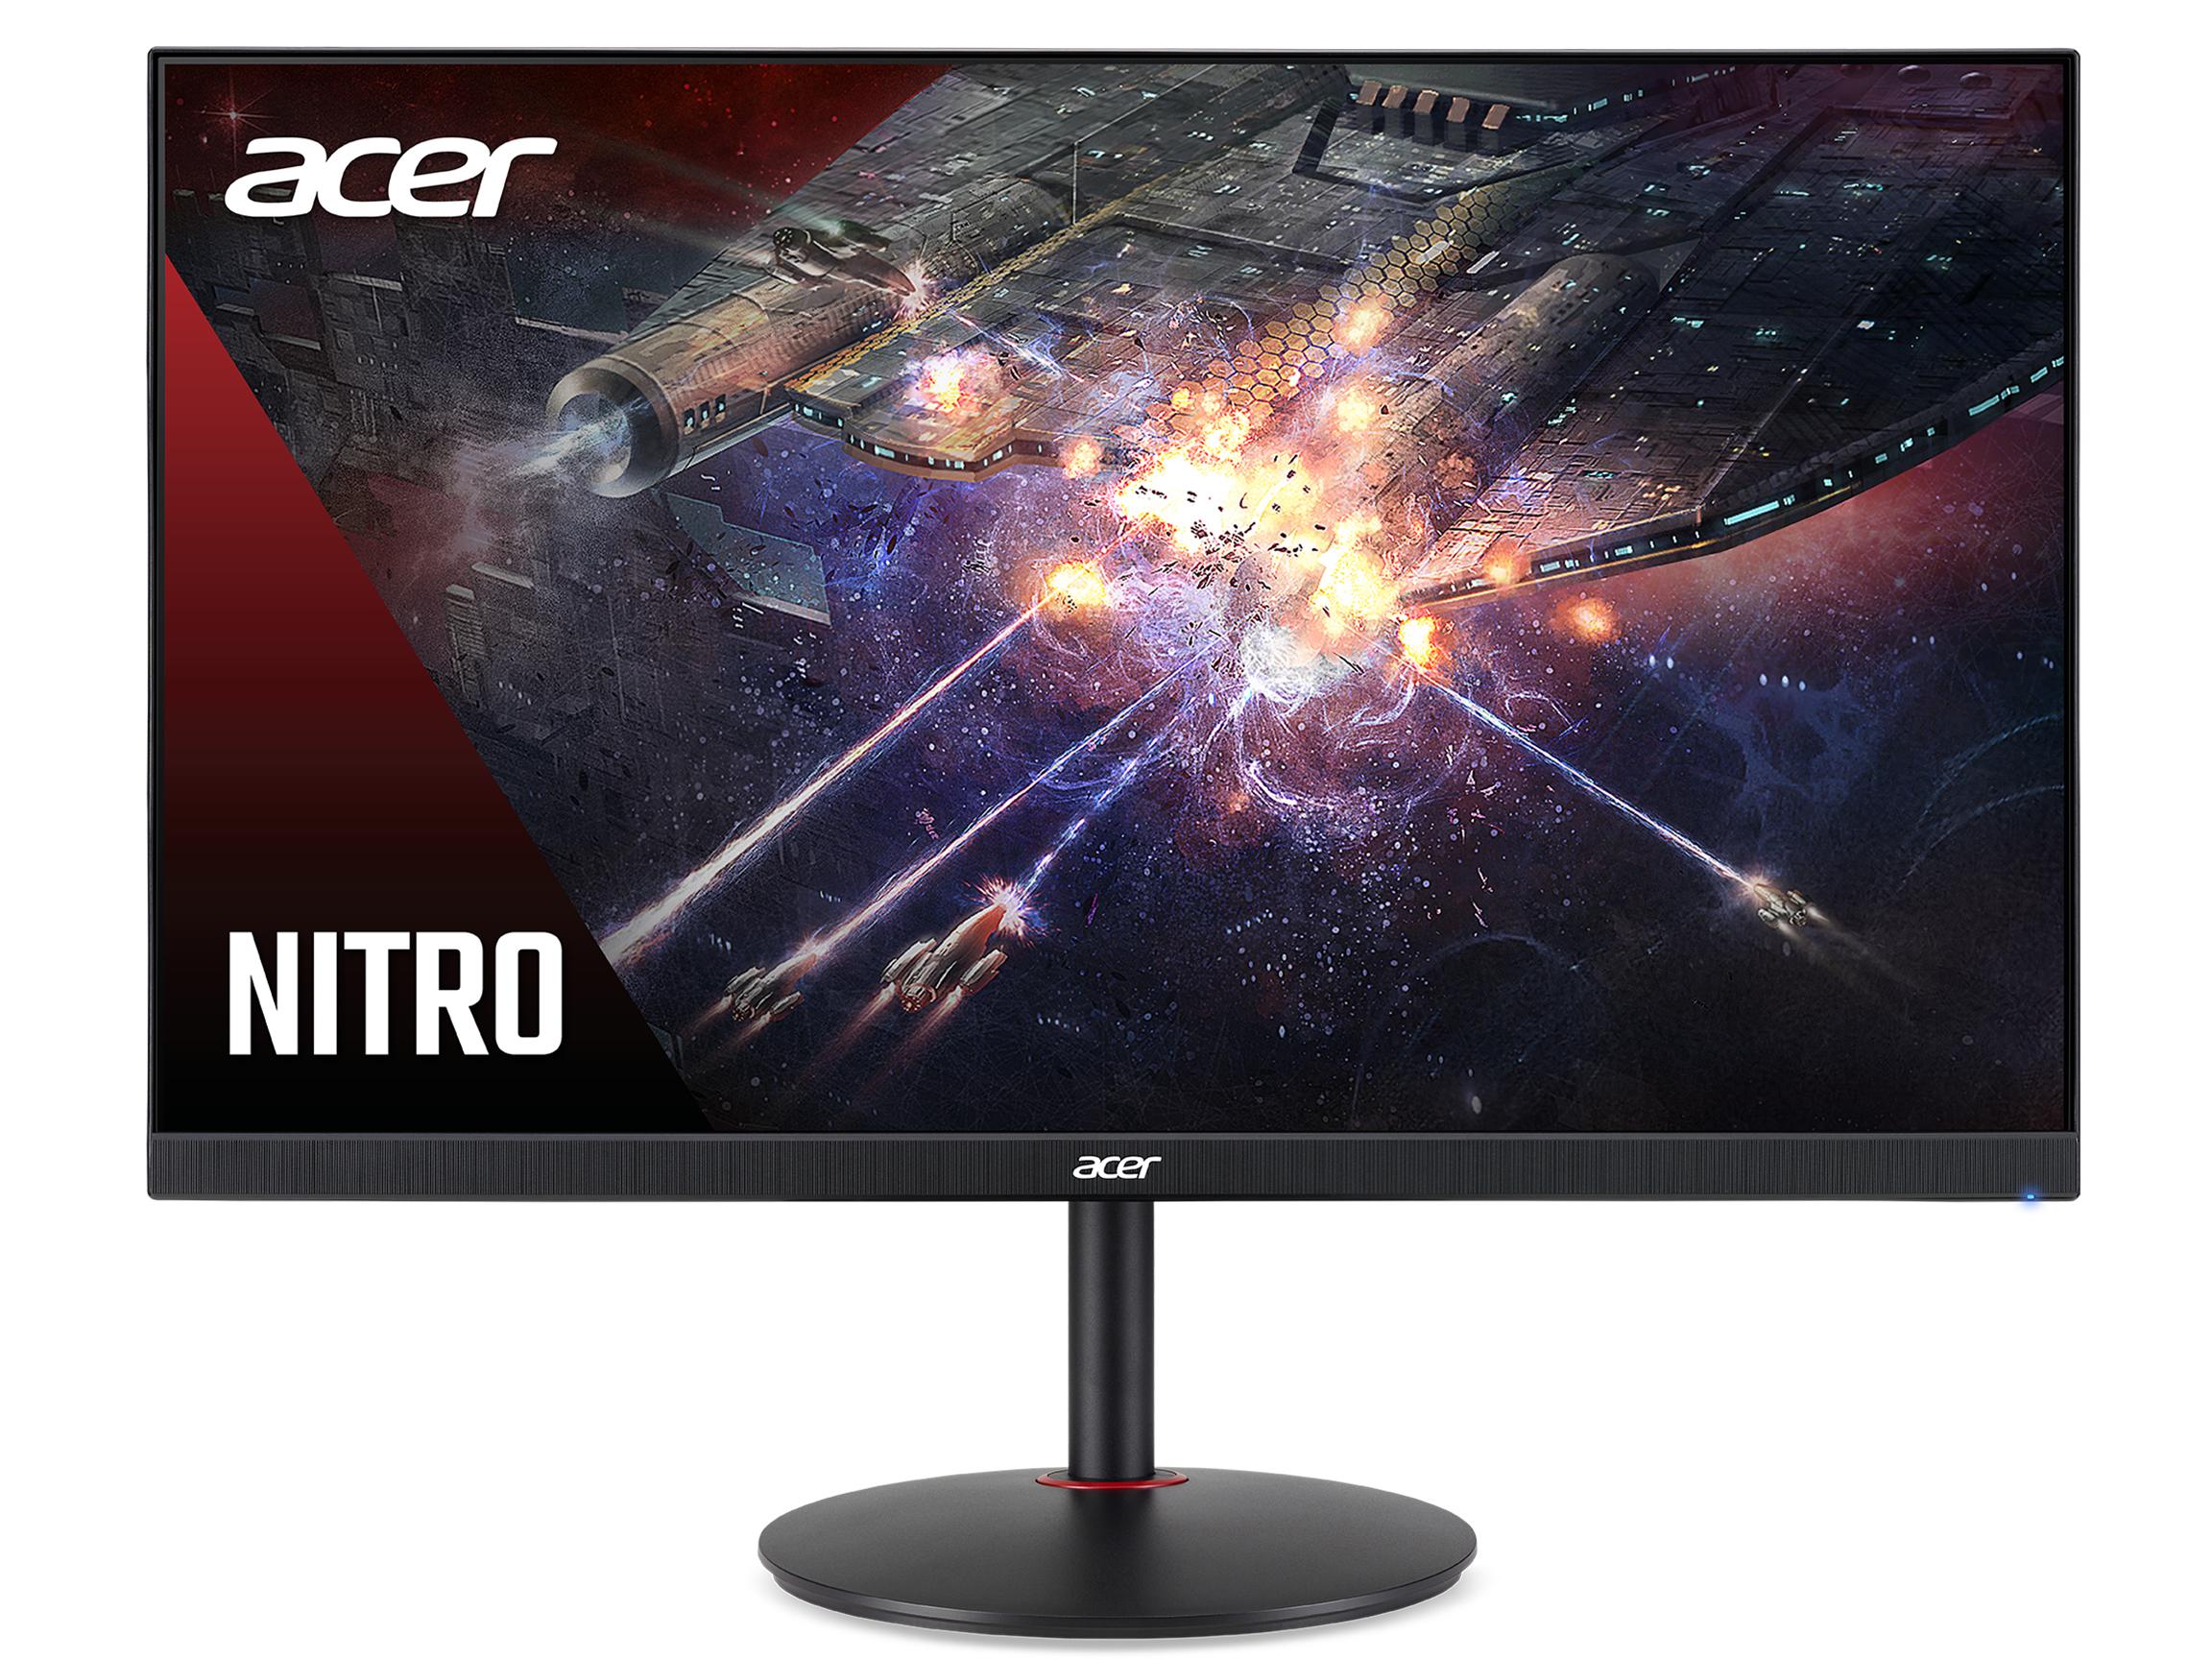 Acer Nitro XV270 27